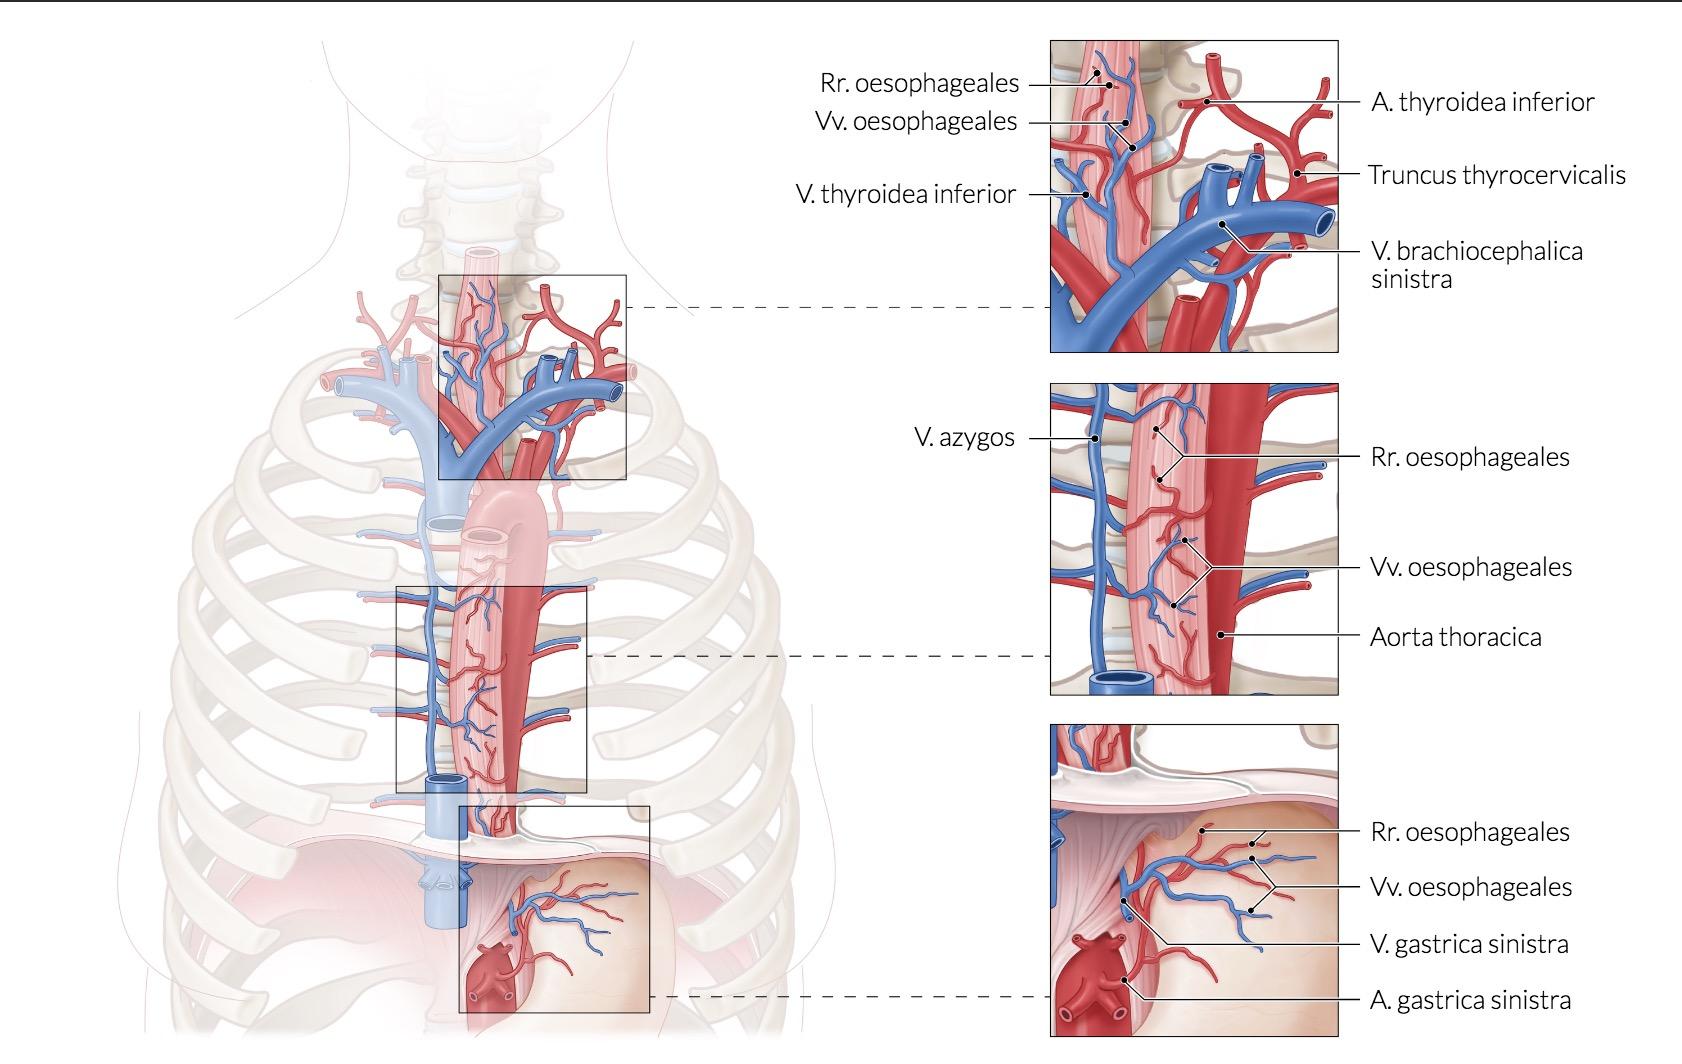 Anastomose über die Oesophagusvene | Anatomie: Rumpf / Thorax